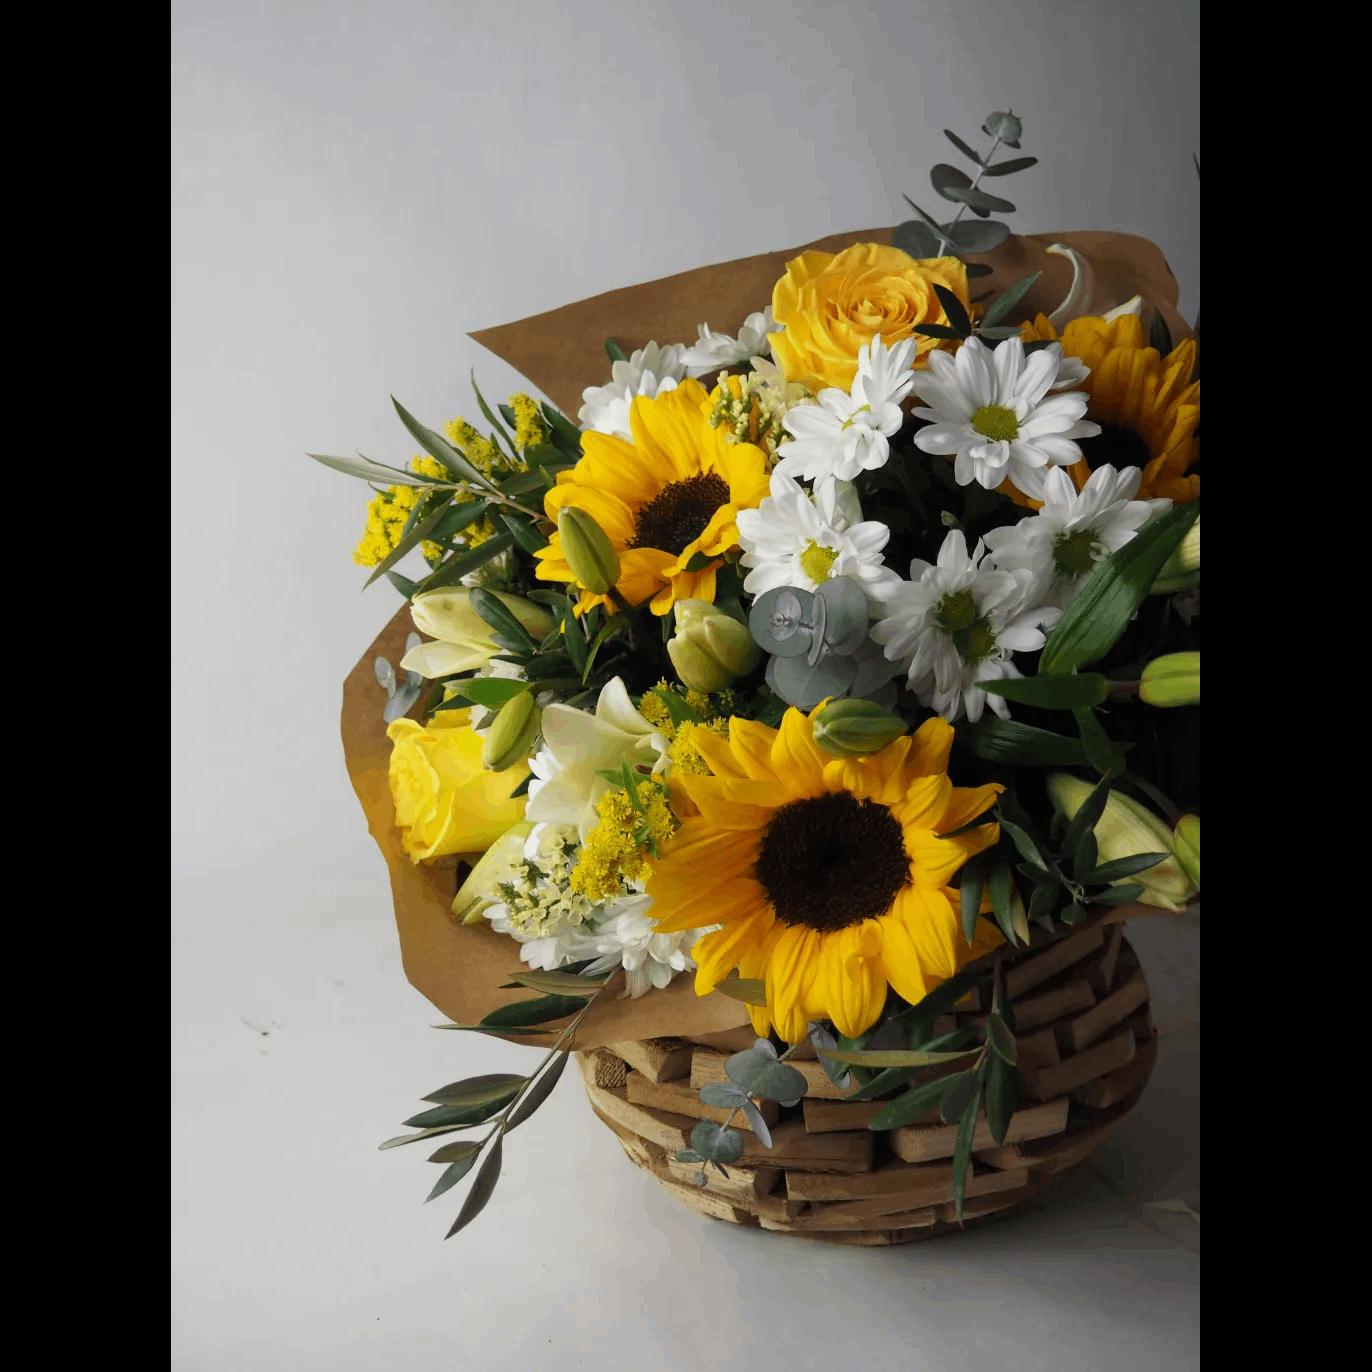 regalar flores rosas amarillas margaritas girasoles